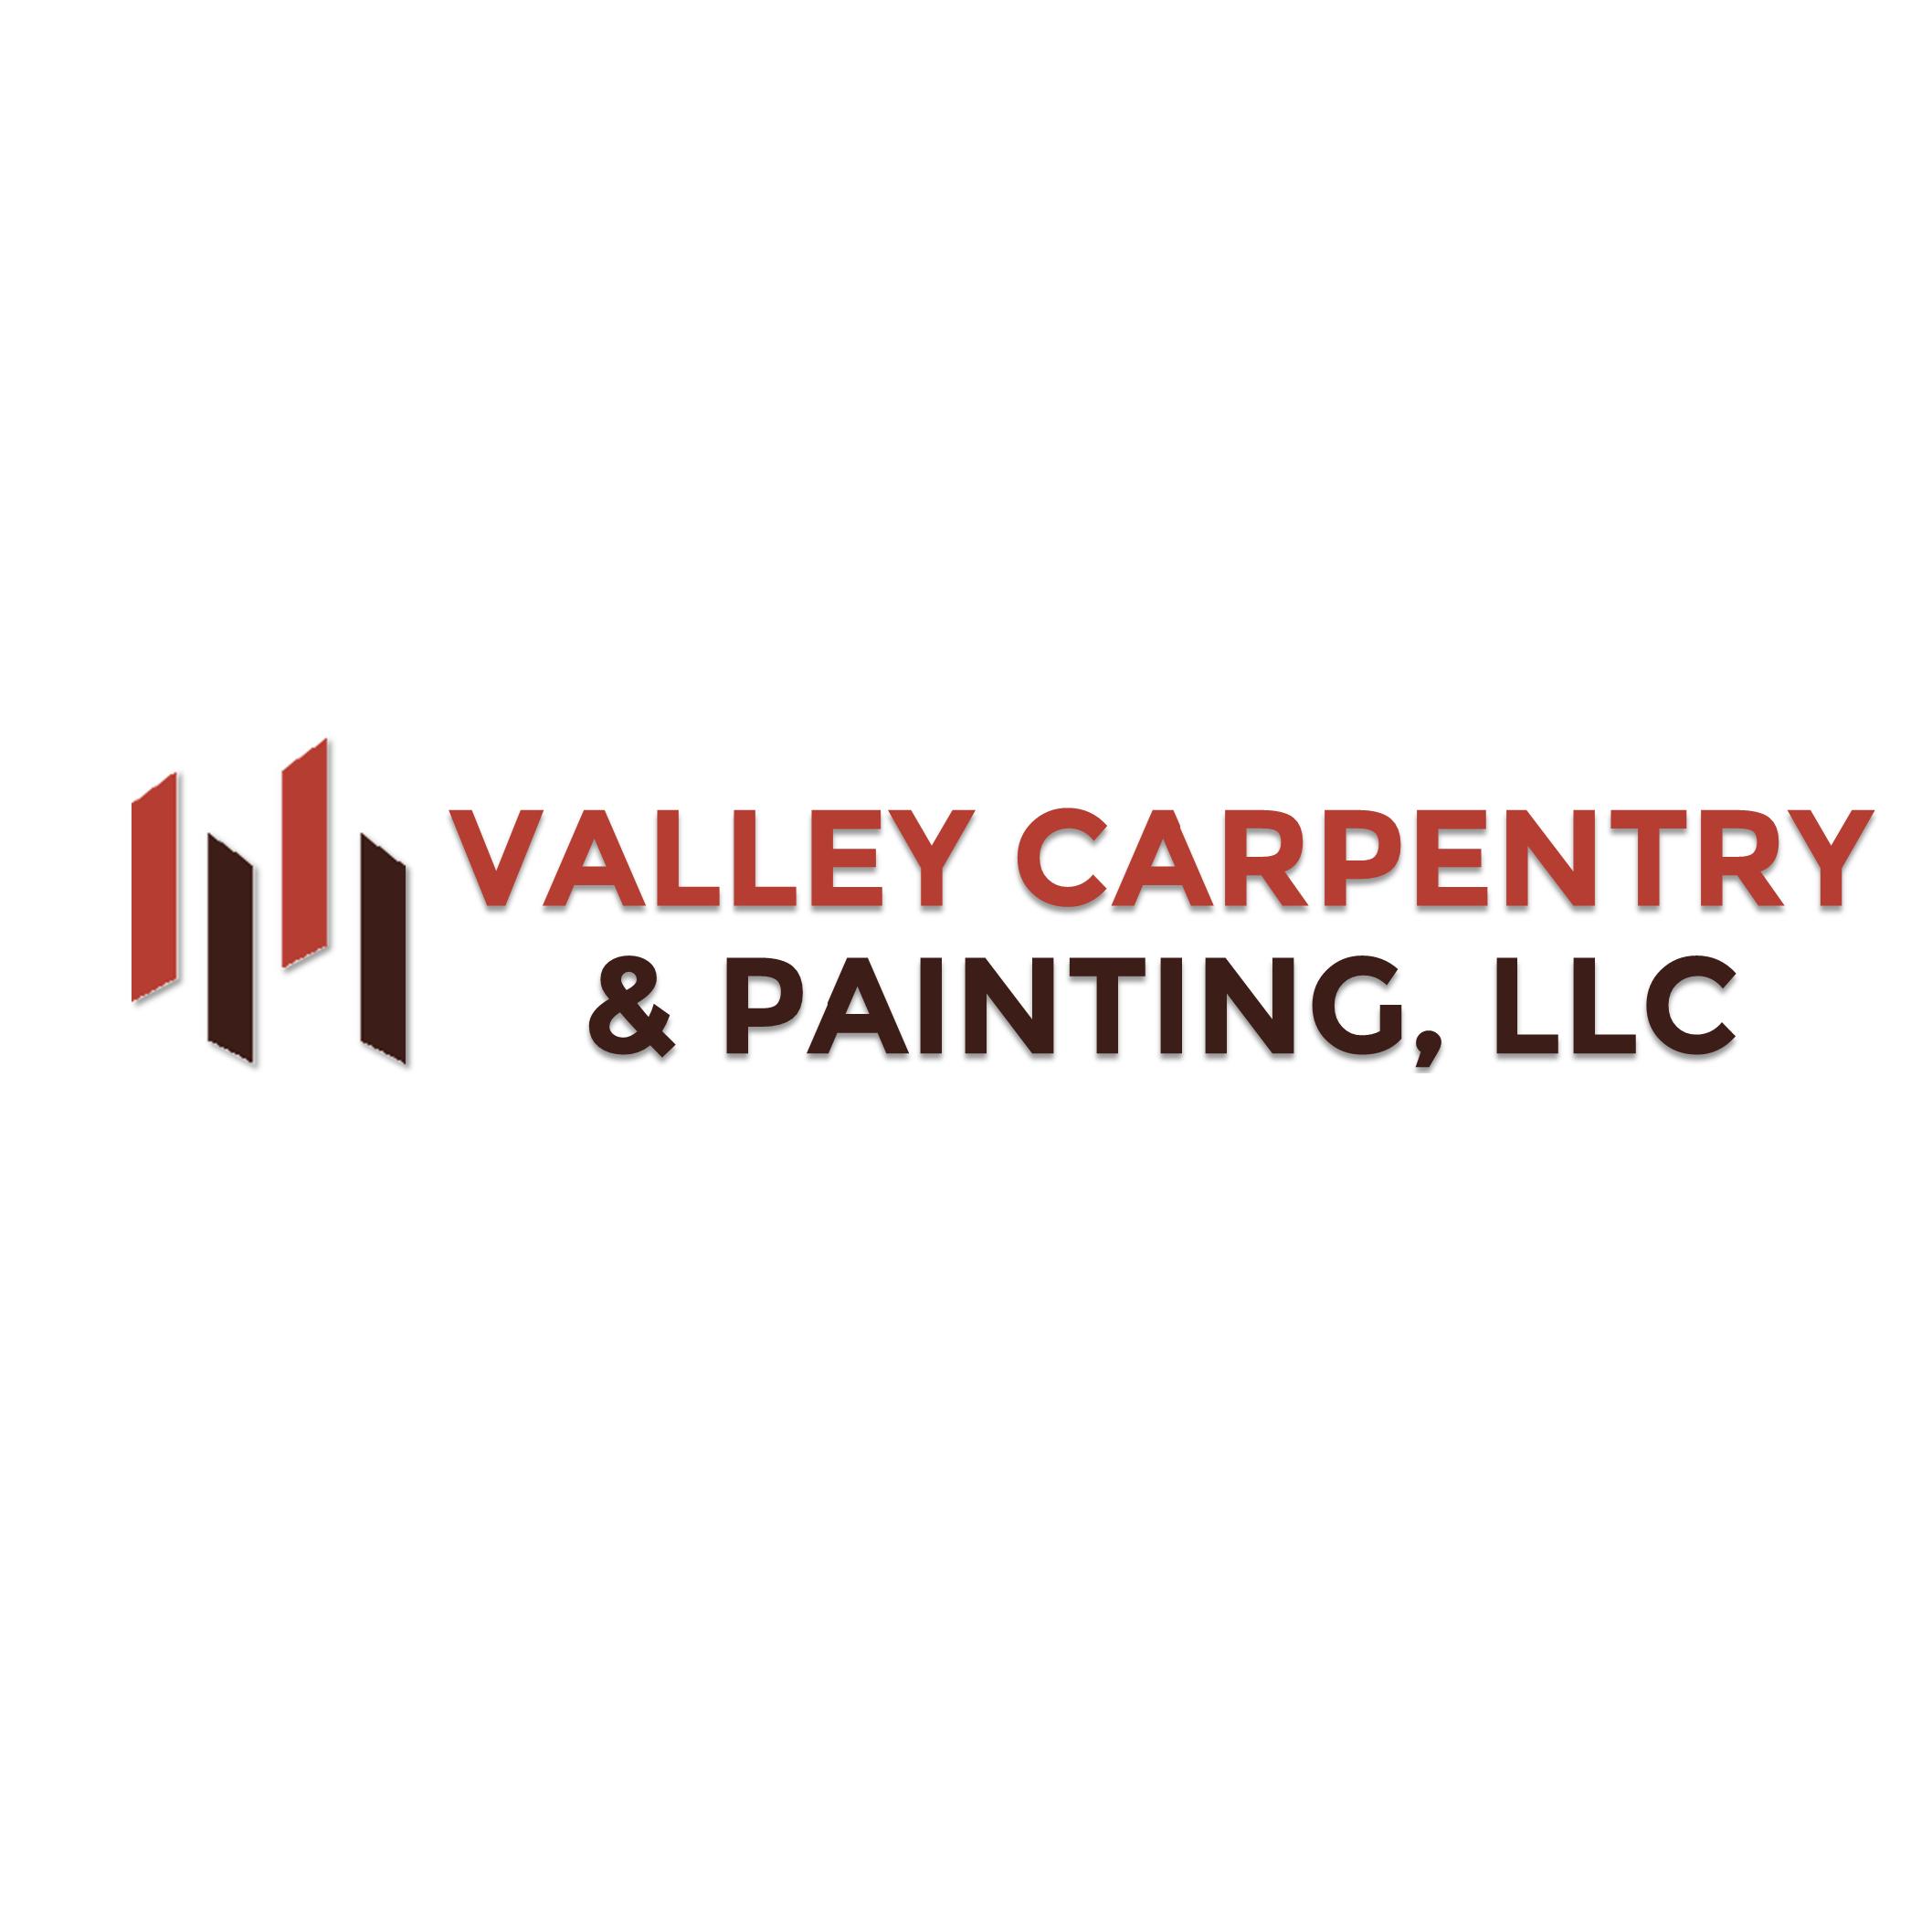 Valley Carpentry & Painting, LLC